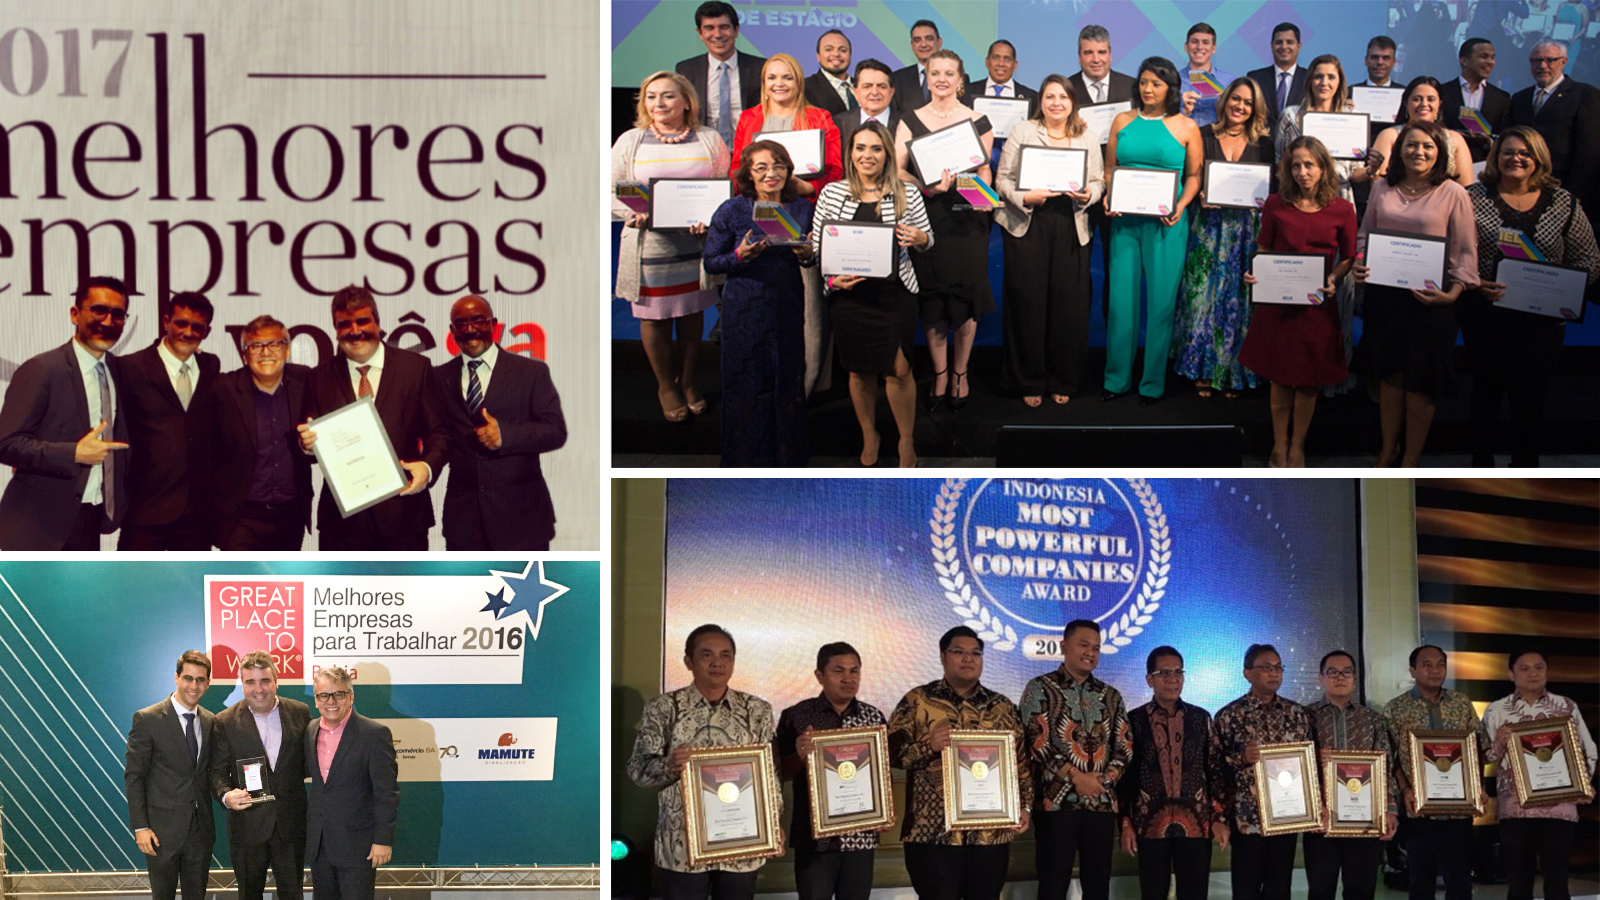 Kordsa continues to be granted awards globally